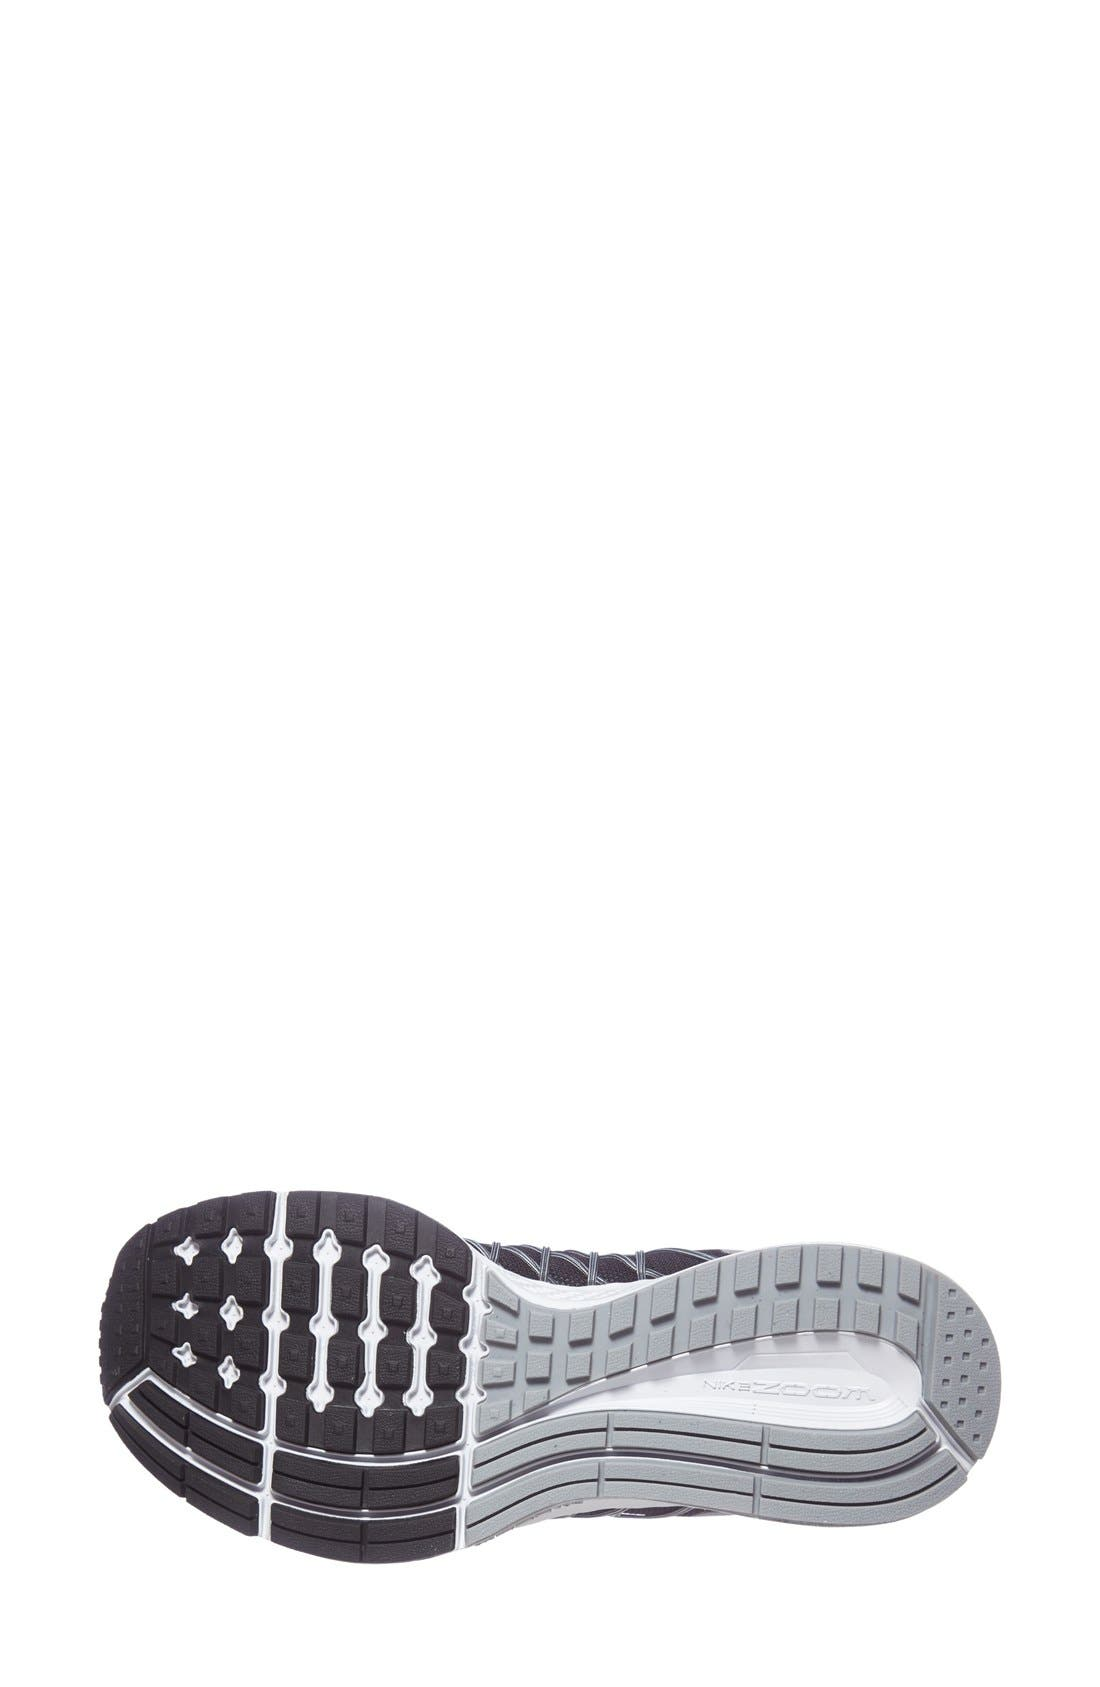 NIKE,                             'Zoom Pegasus 32 - Flash' h2o Repel Running Shoe,                             Alternate thumbnail 3, color,                             001